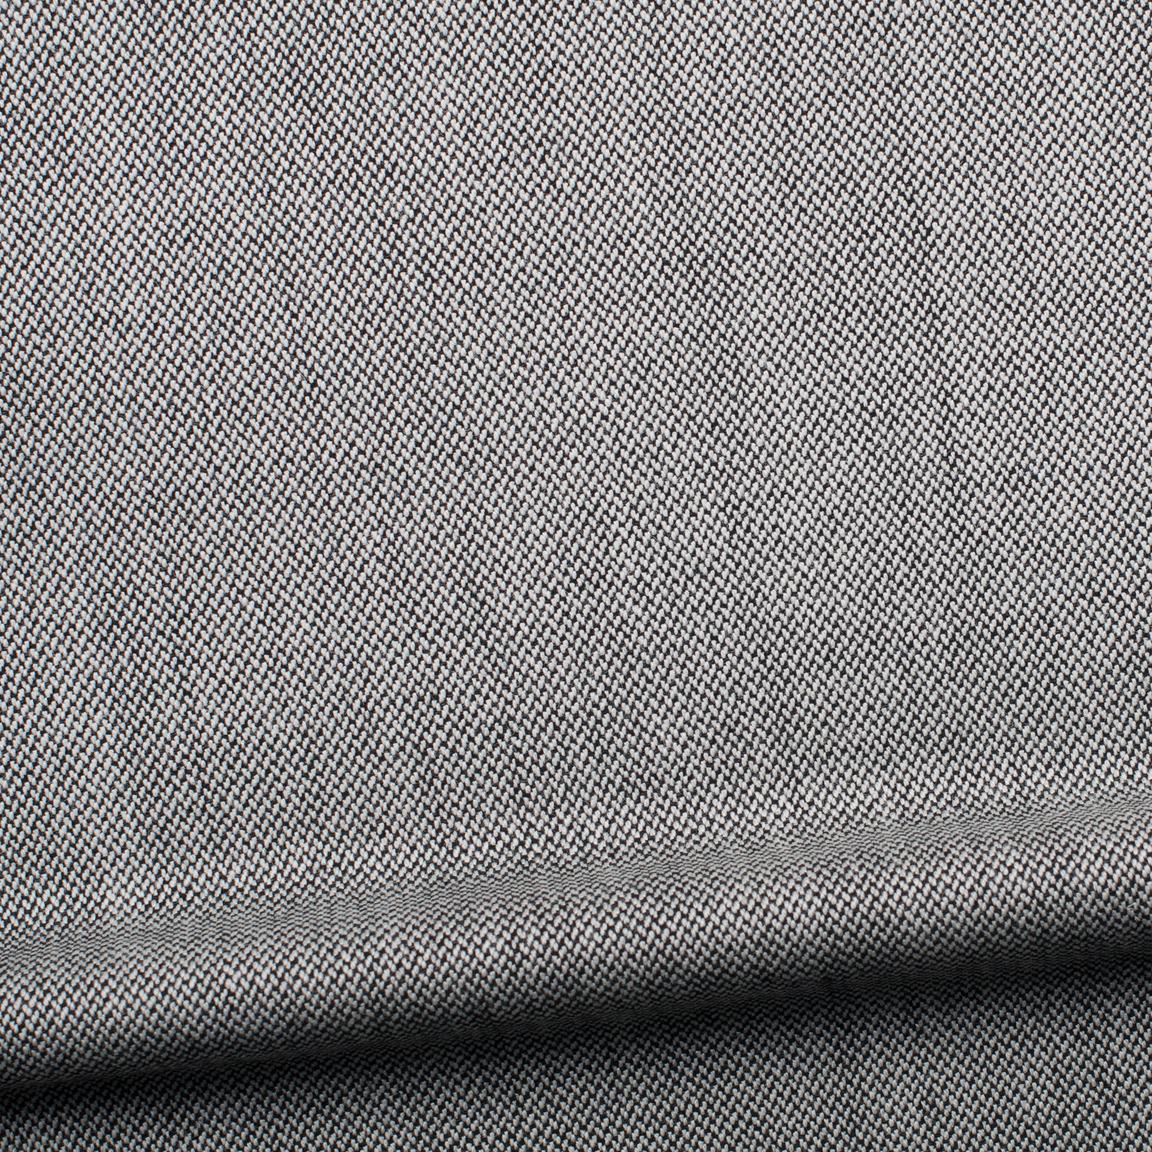 Bowmore, light gray